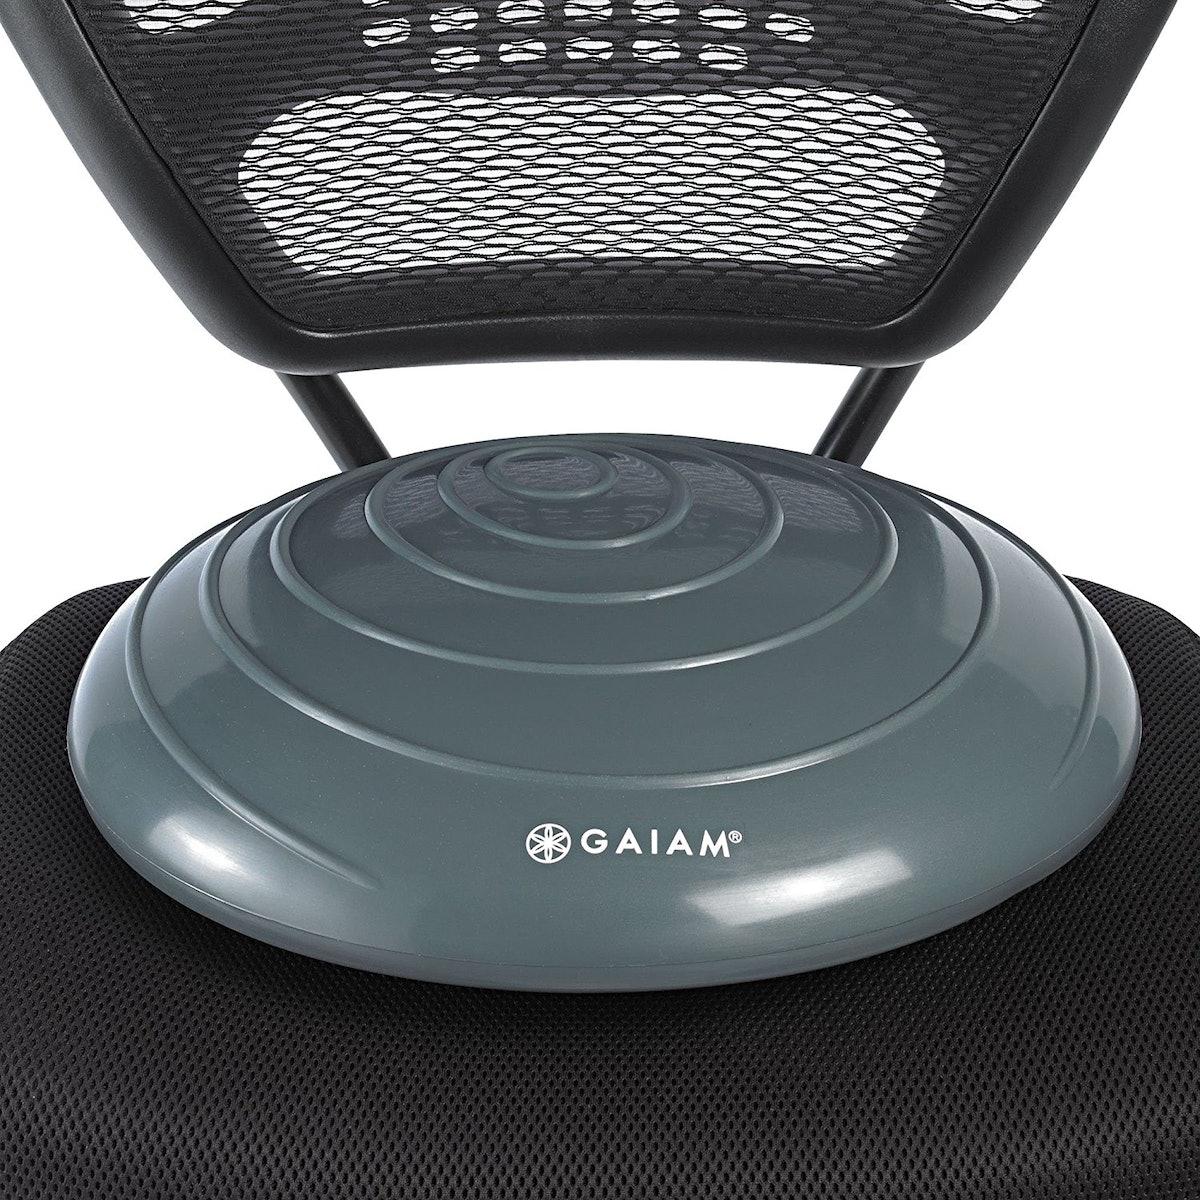 Gaiam Balancing Disc